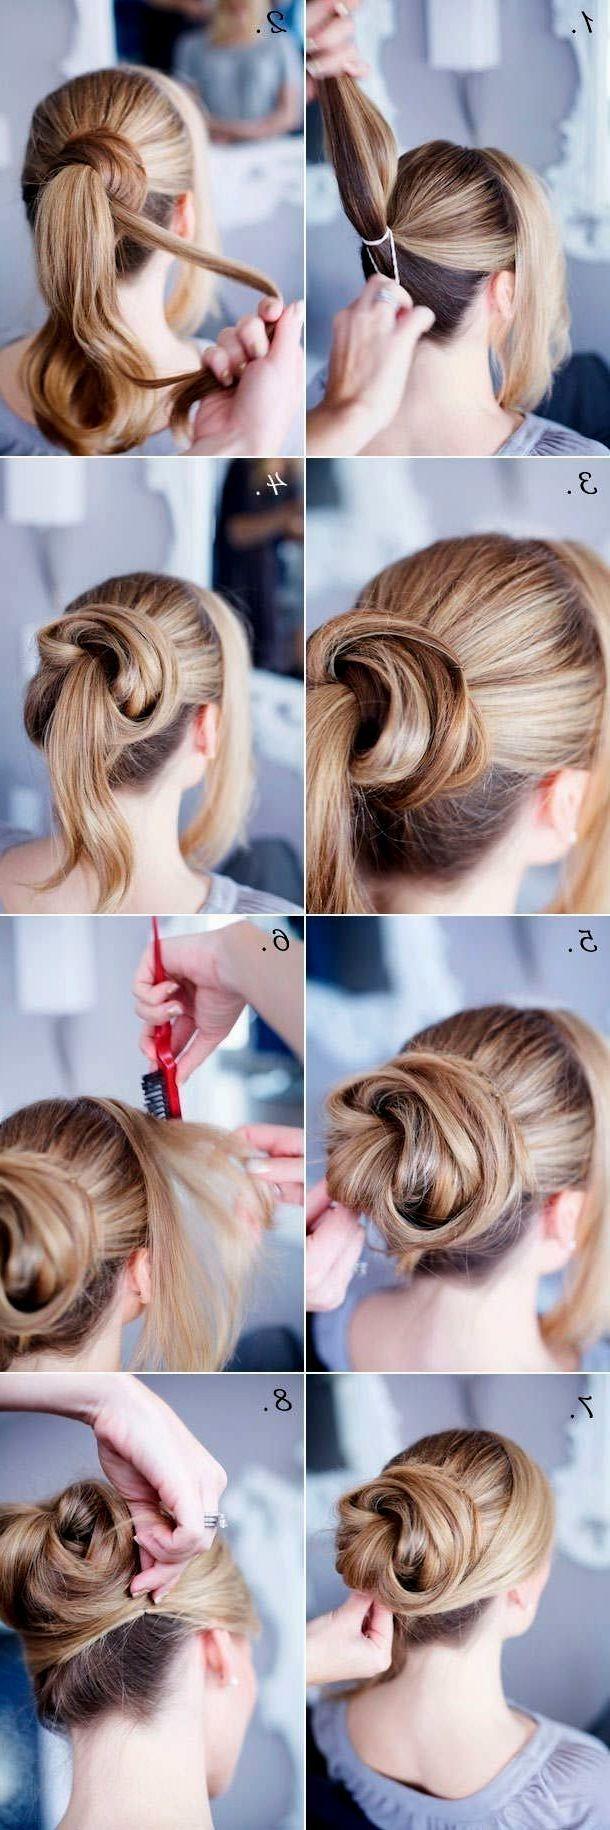 Easy Cute Updos for Medium Hair   Work hairstyles